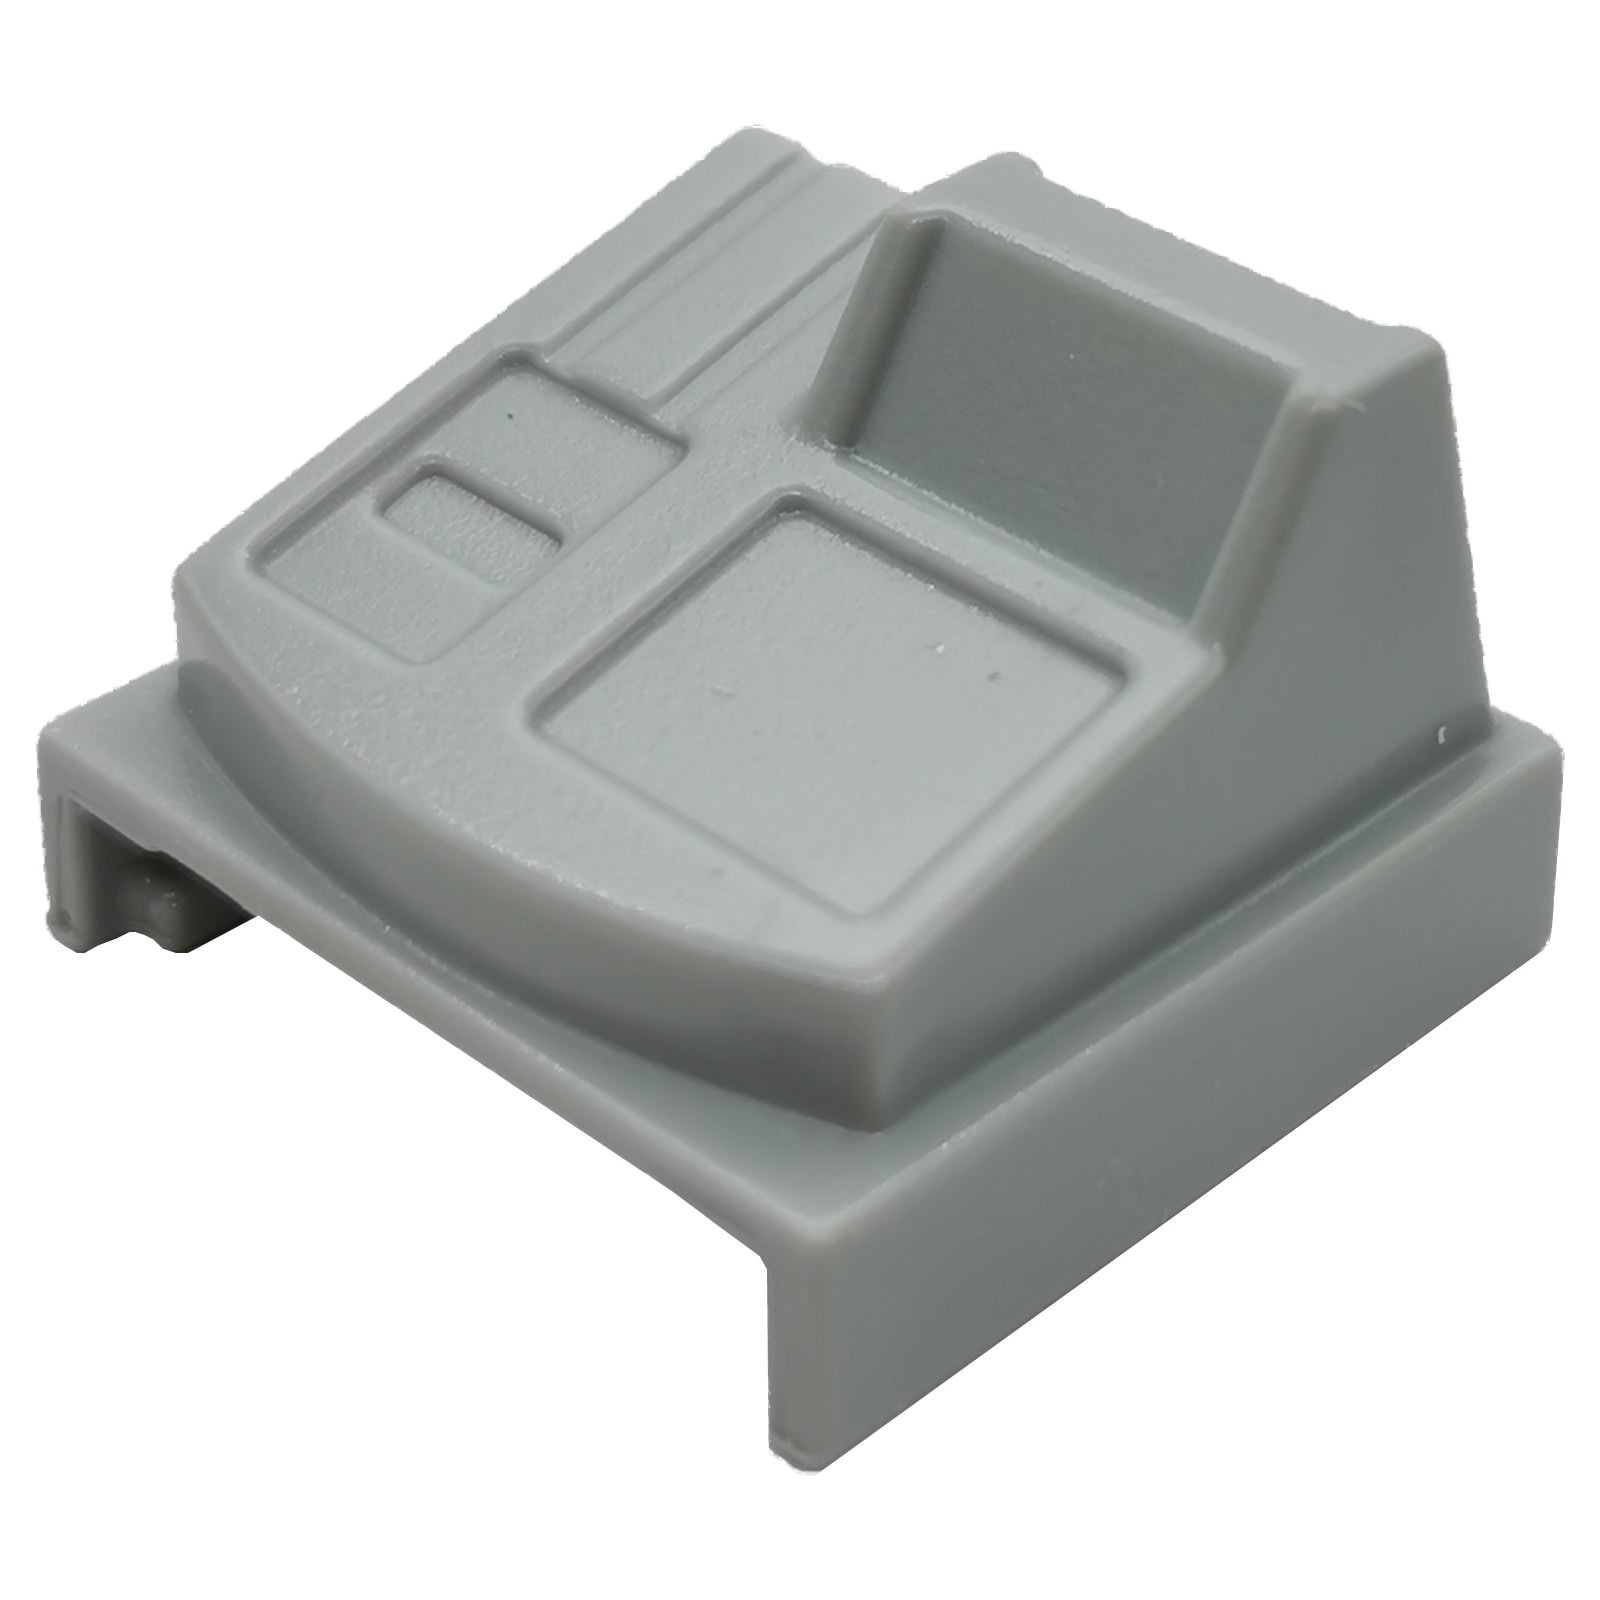 playmobil kasse 30267400 6121 gem sestand playmobil country set ersatzteile gebraucht. Black Bedroom Furniture Sets. Home Design Ideas